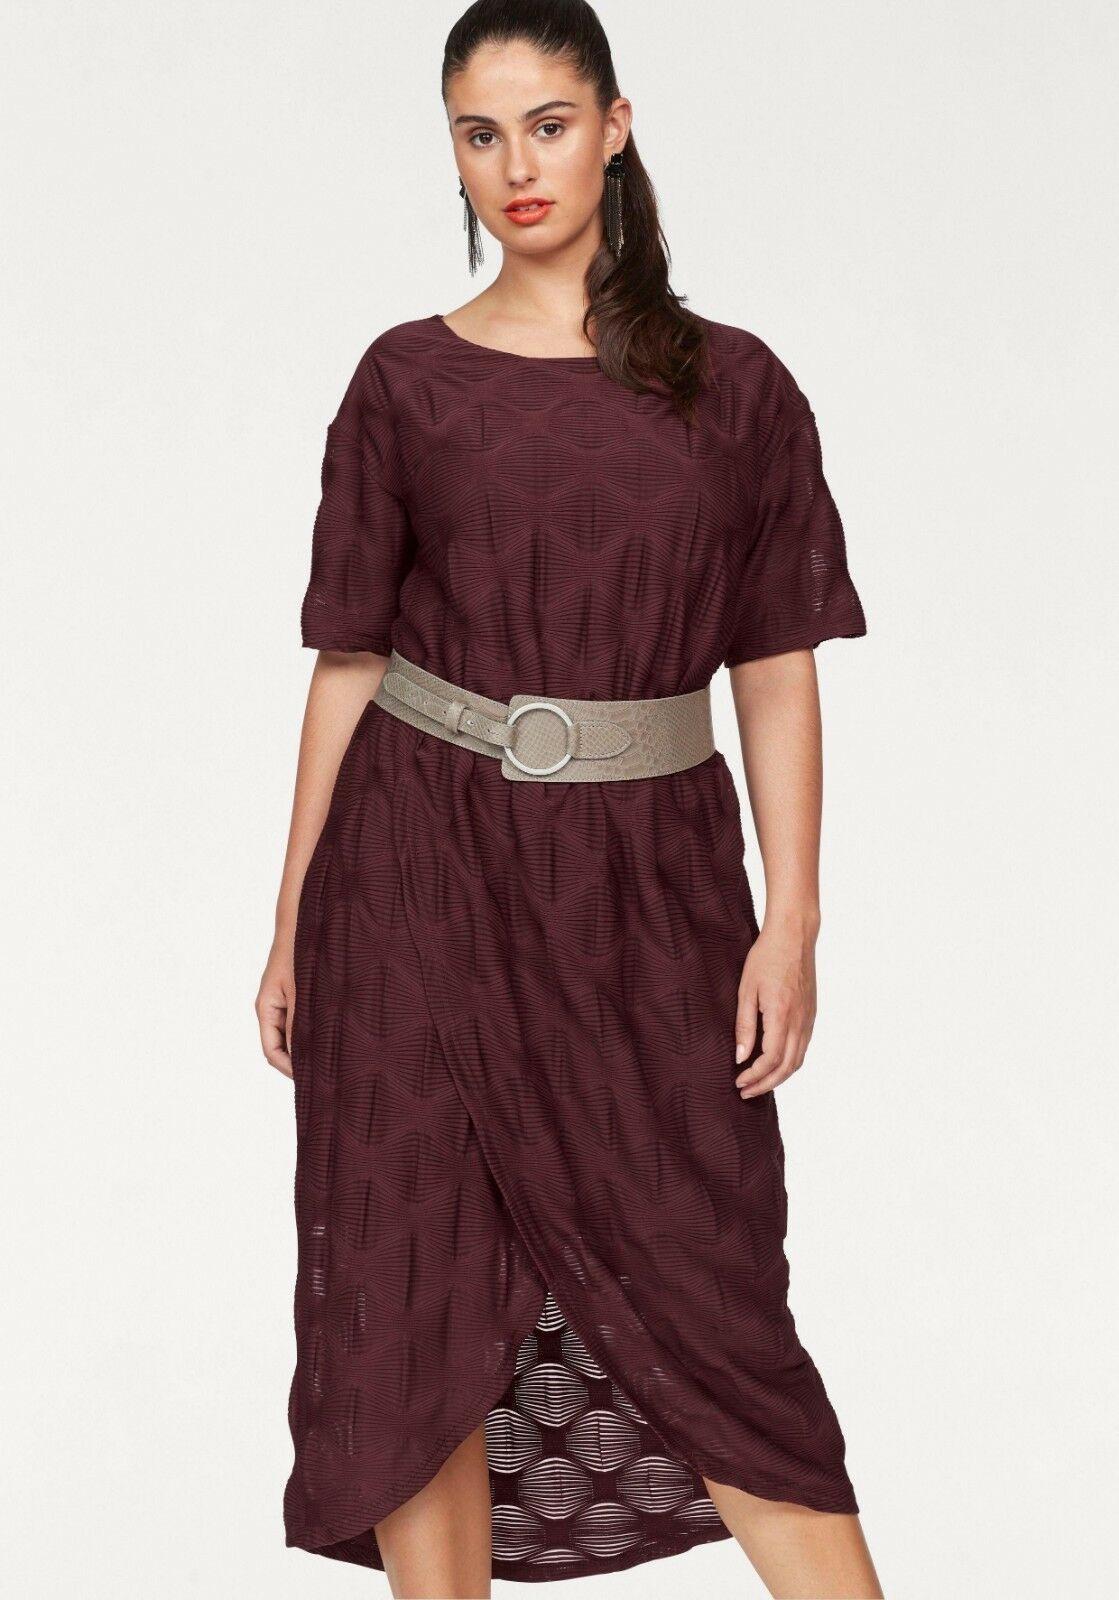 10 Genial Kleid Gr 50 SpezialgebietAbend Einfach Kleid Gr 50 Spezialgebiet